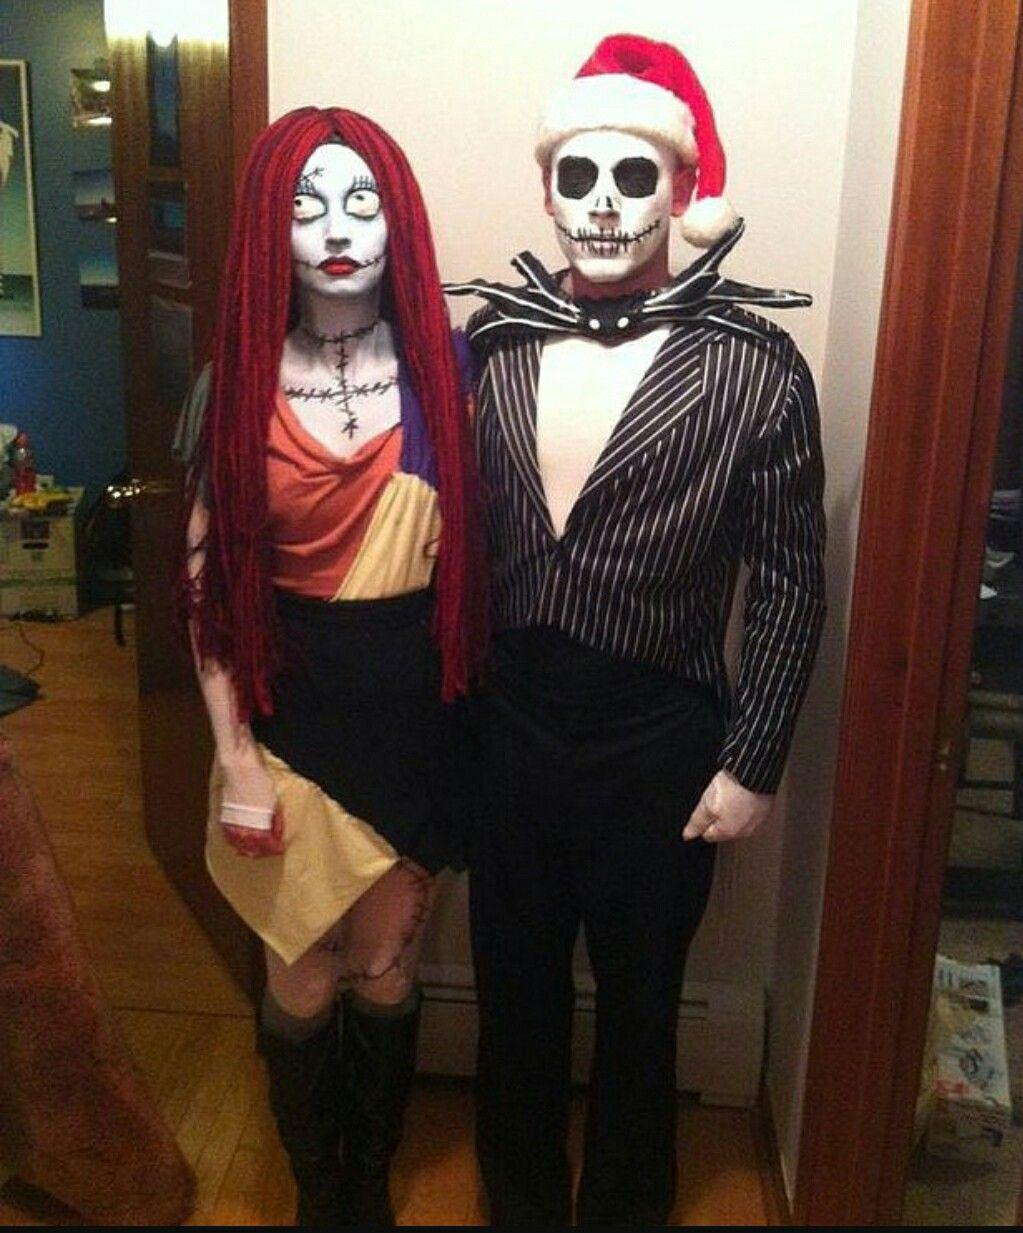 disfraces en pareja halloween couple ideas pinterest deguisement halloween halloween and. Black Bedroom Furniture Sets. Home Design Ideas